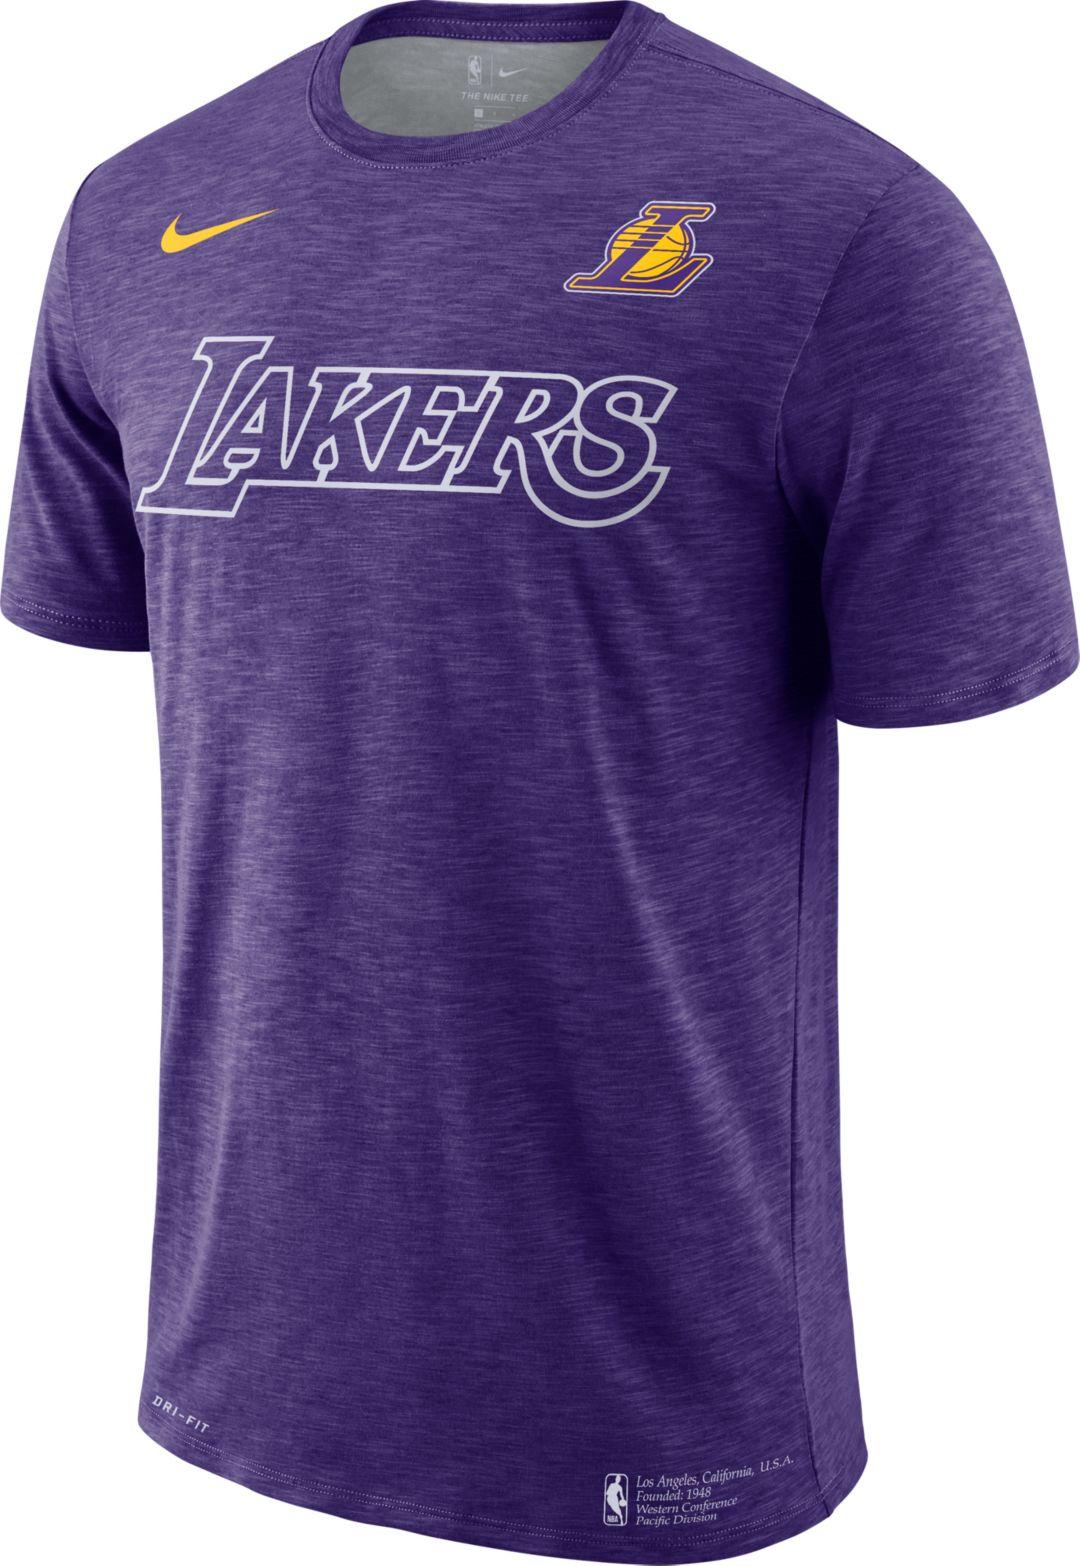 best service 9a0bb 03e2a Nike Men's Los Angeles Lakers Dri-FIT Facility T-Shirt